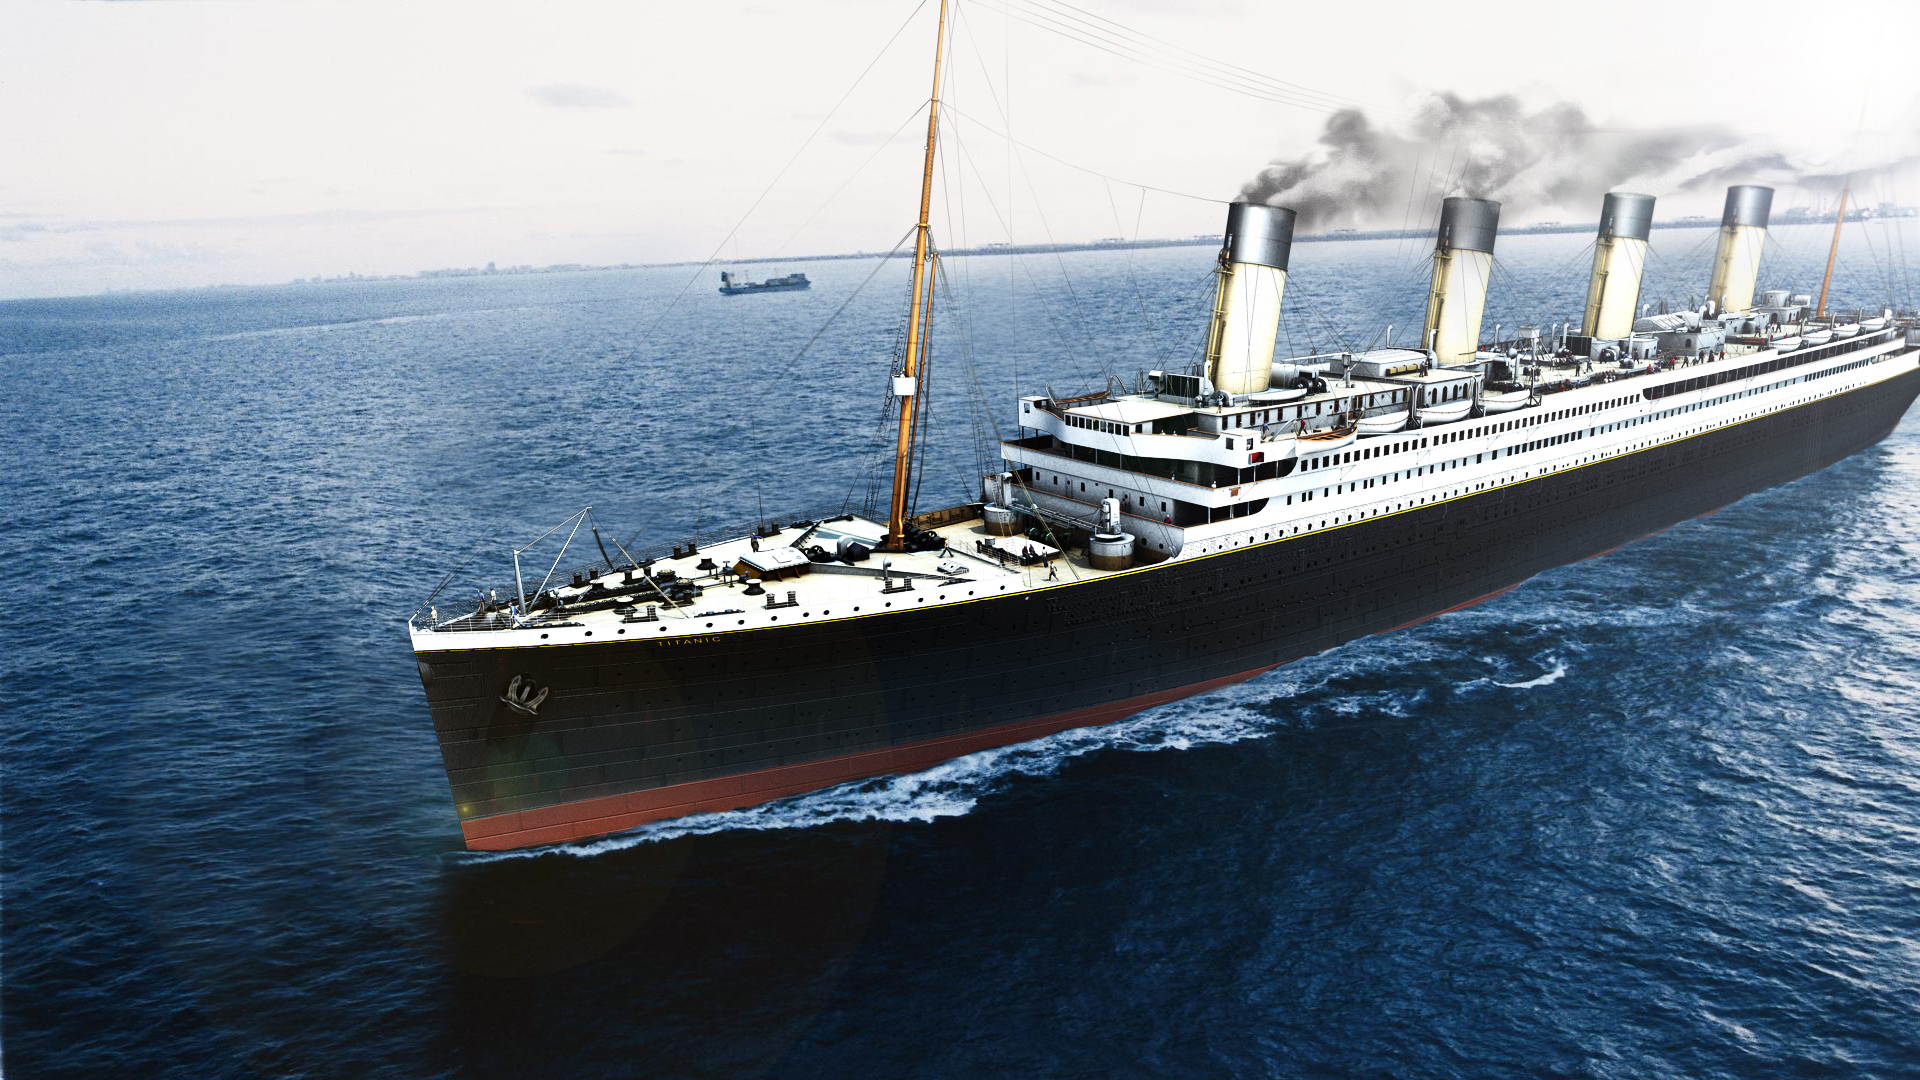 Hd Wallpaper Download Of Super Cars Titanic Ship Wallpapers Hd